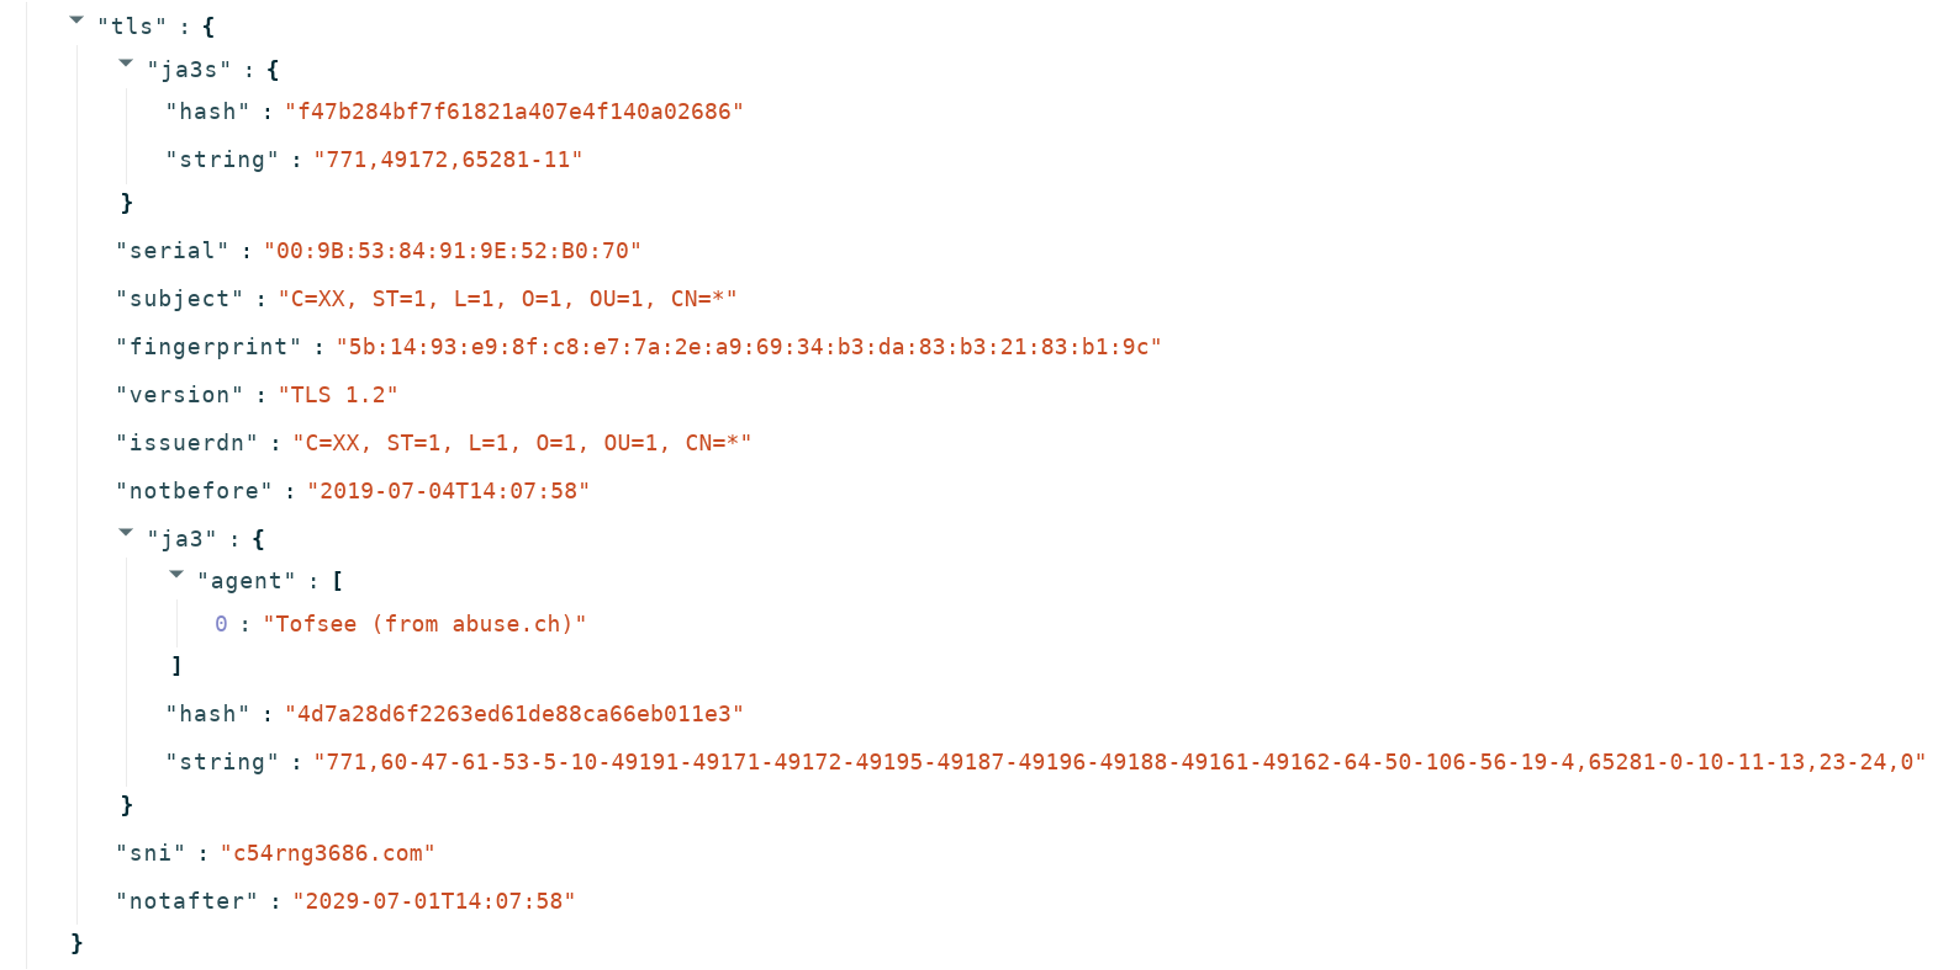 Suricata TLS event in JSON format